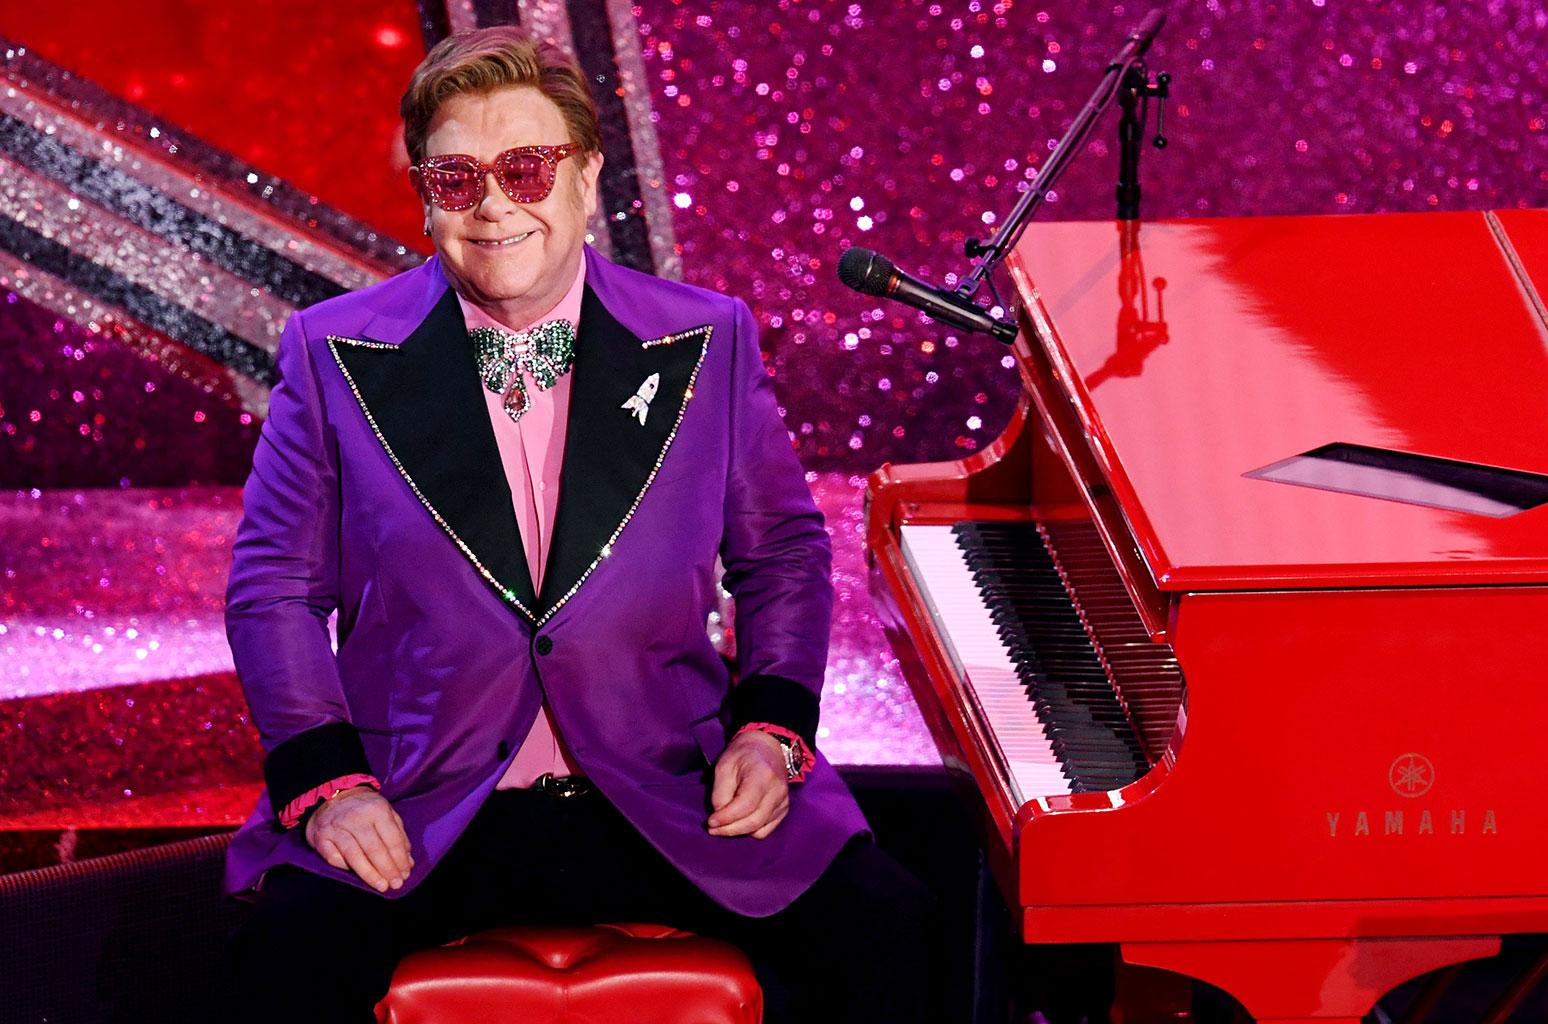 Elton John cuts concert short due to walking pneumonia